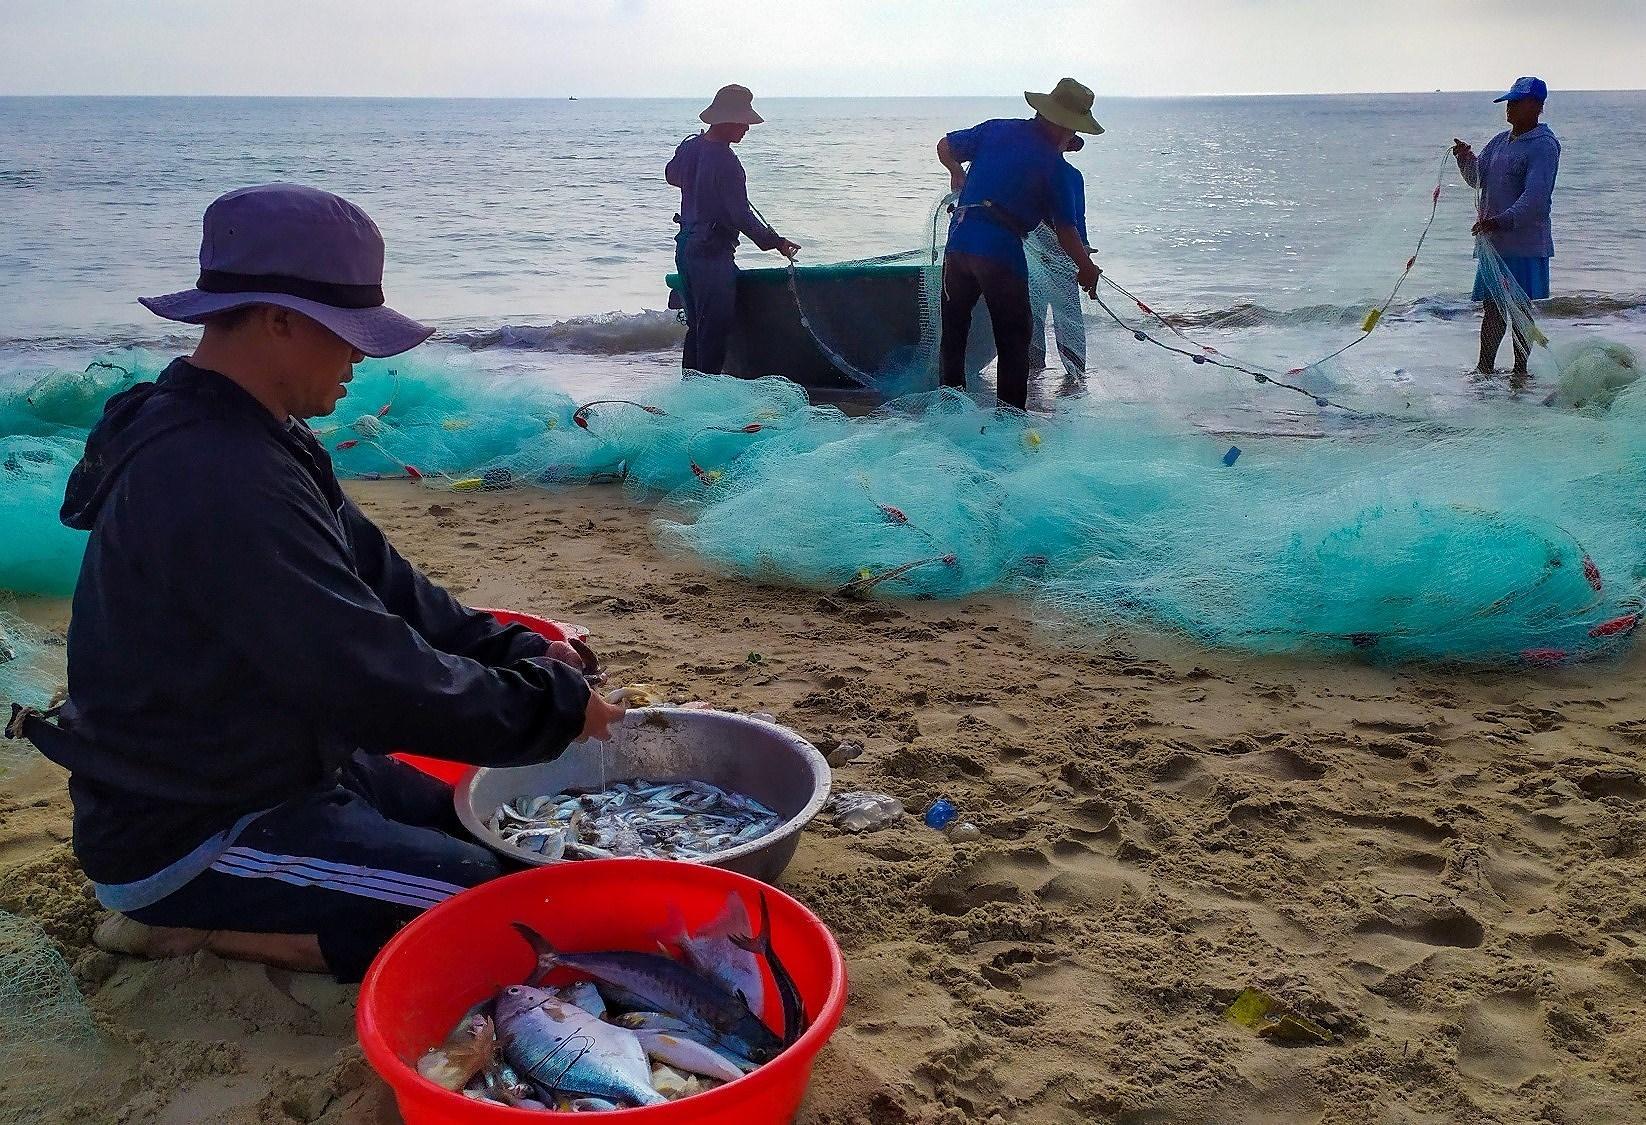 Fishermen pull in nets in Da Nang city hinh anh 6